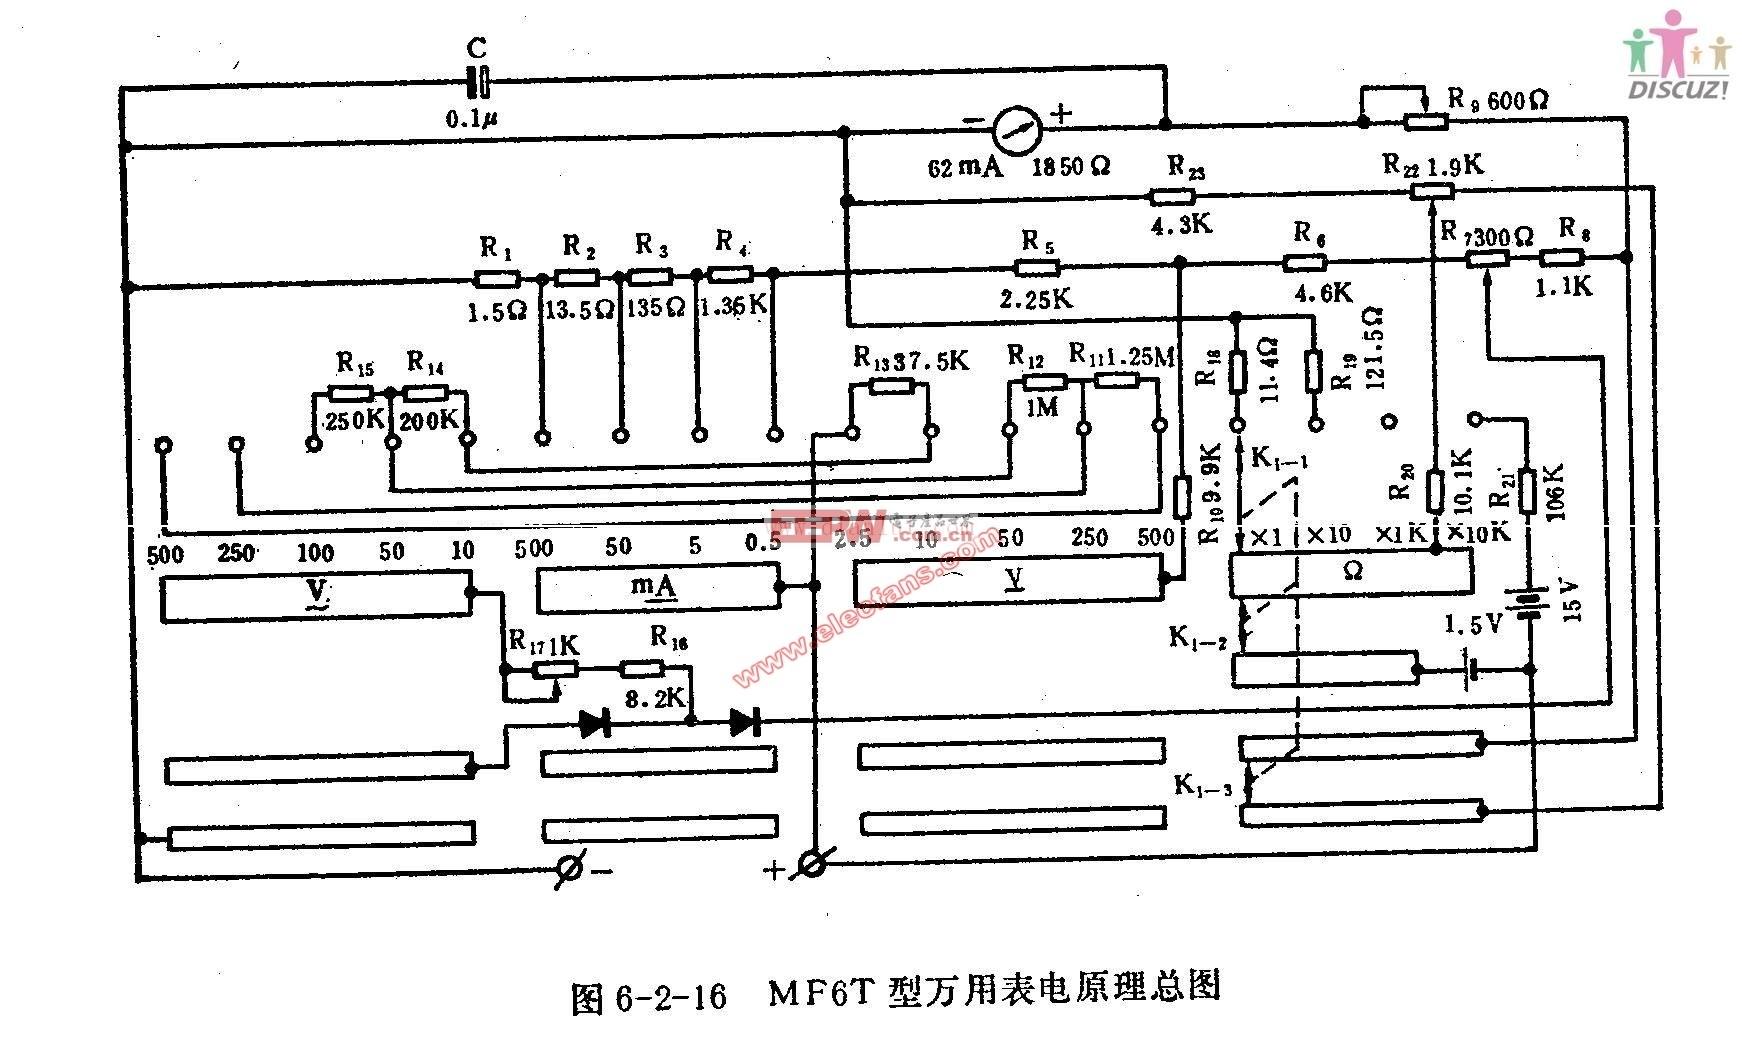 MF6T型万用表电路图